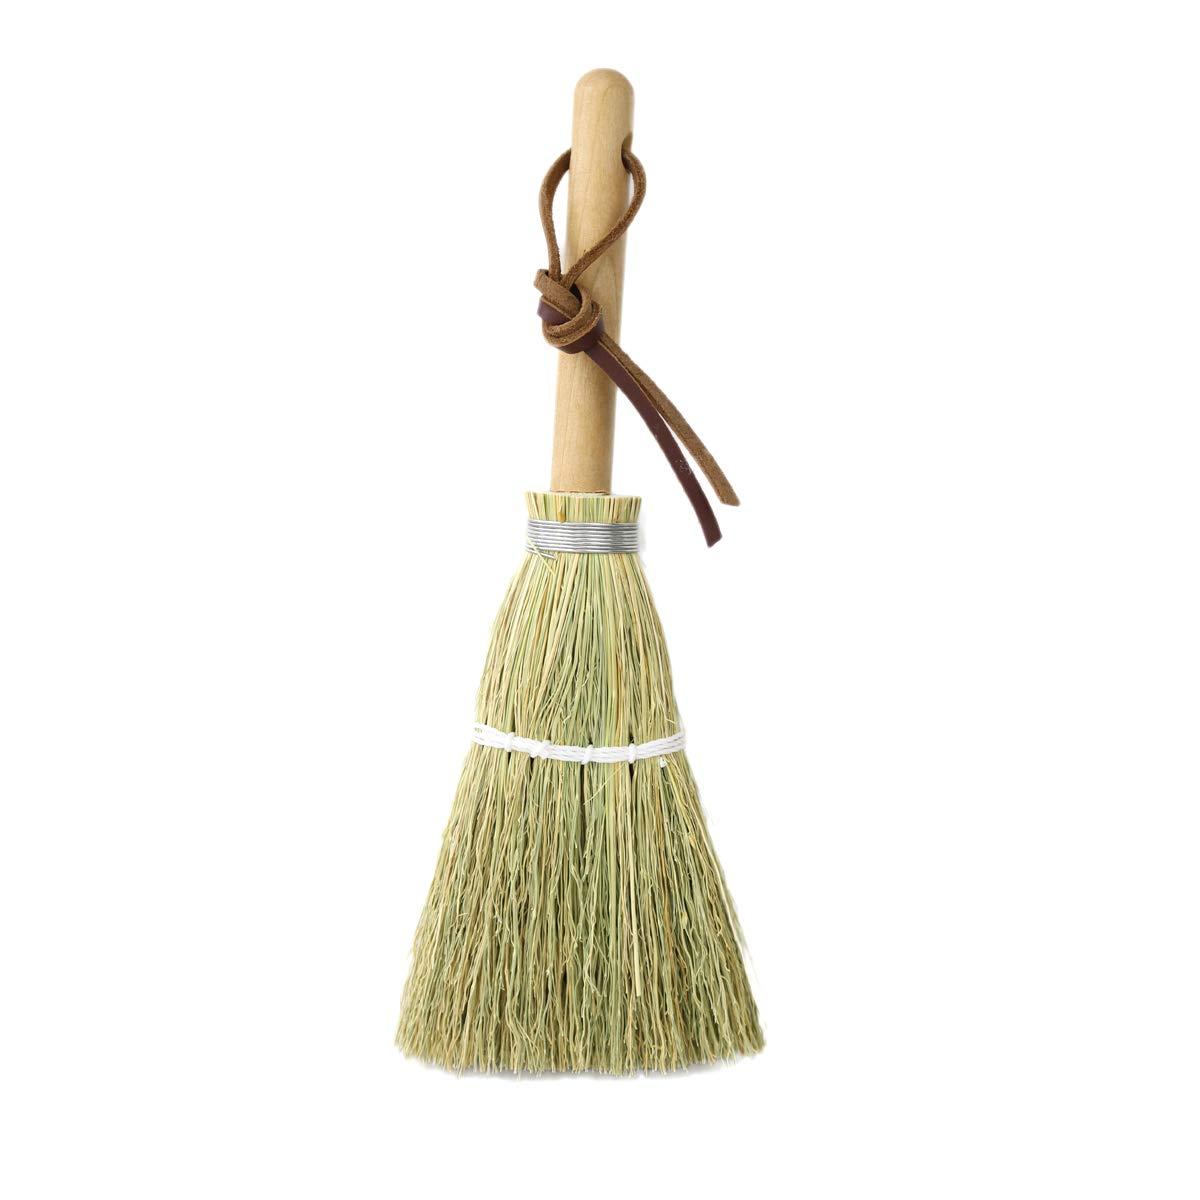 Camden Rose Child's Whisk Broom (Short, hand broom), Natural by Camden Rose